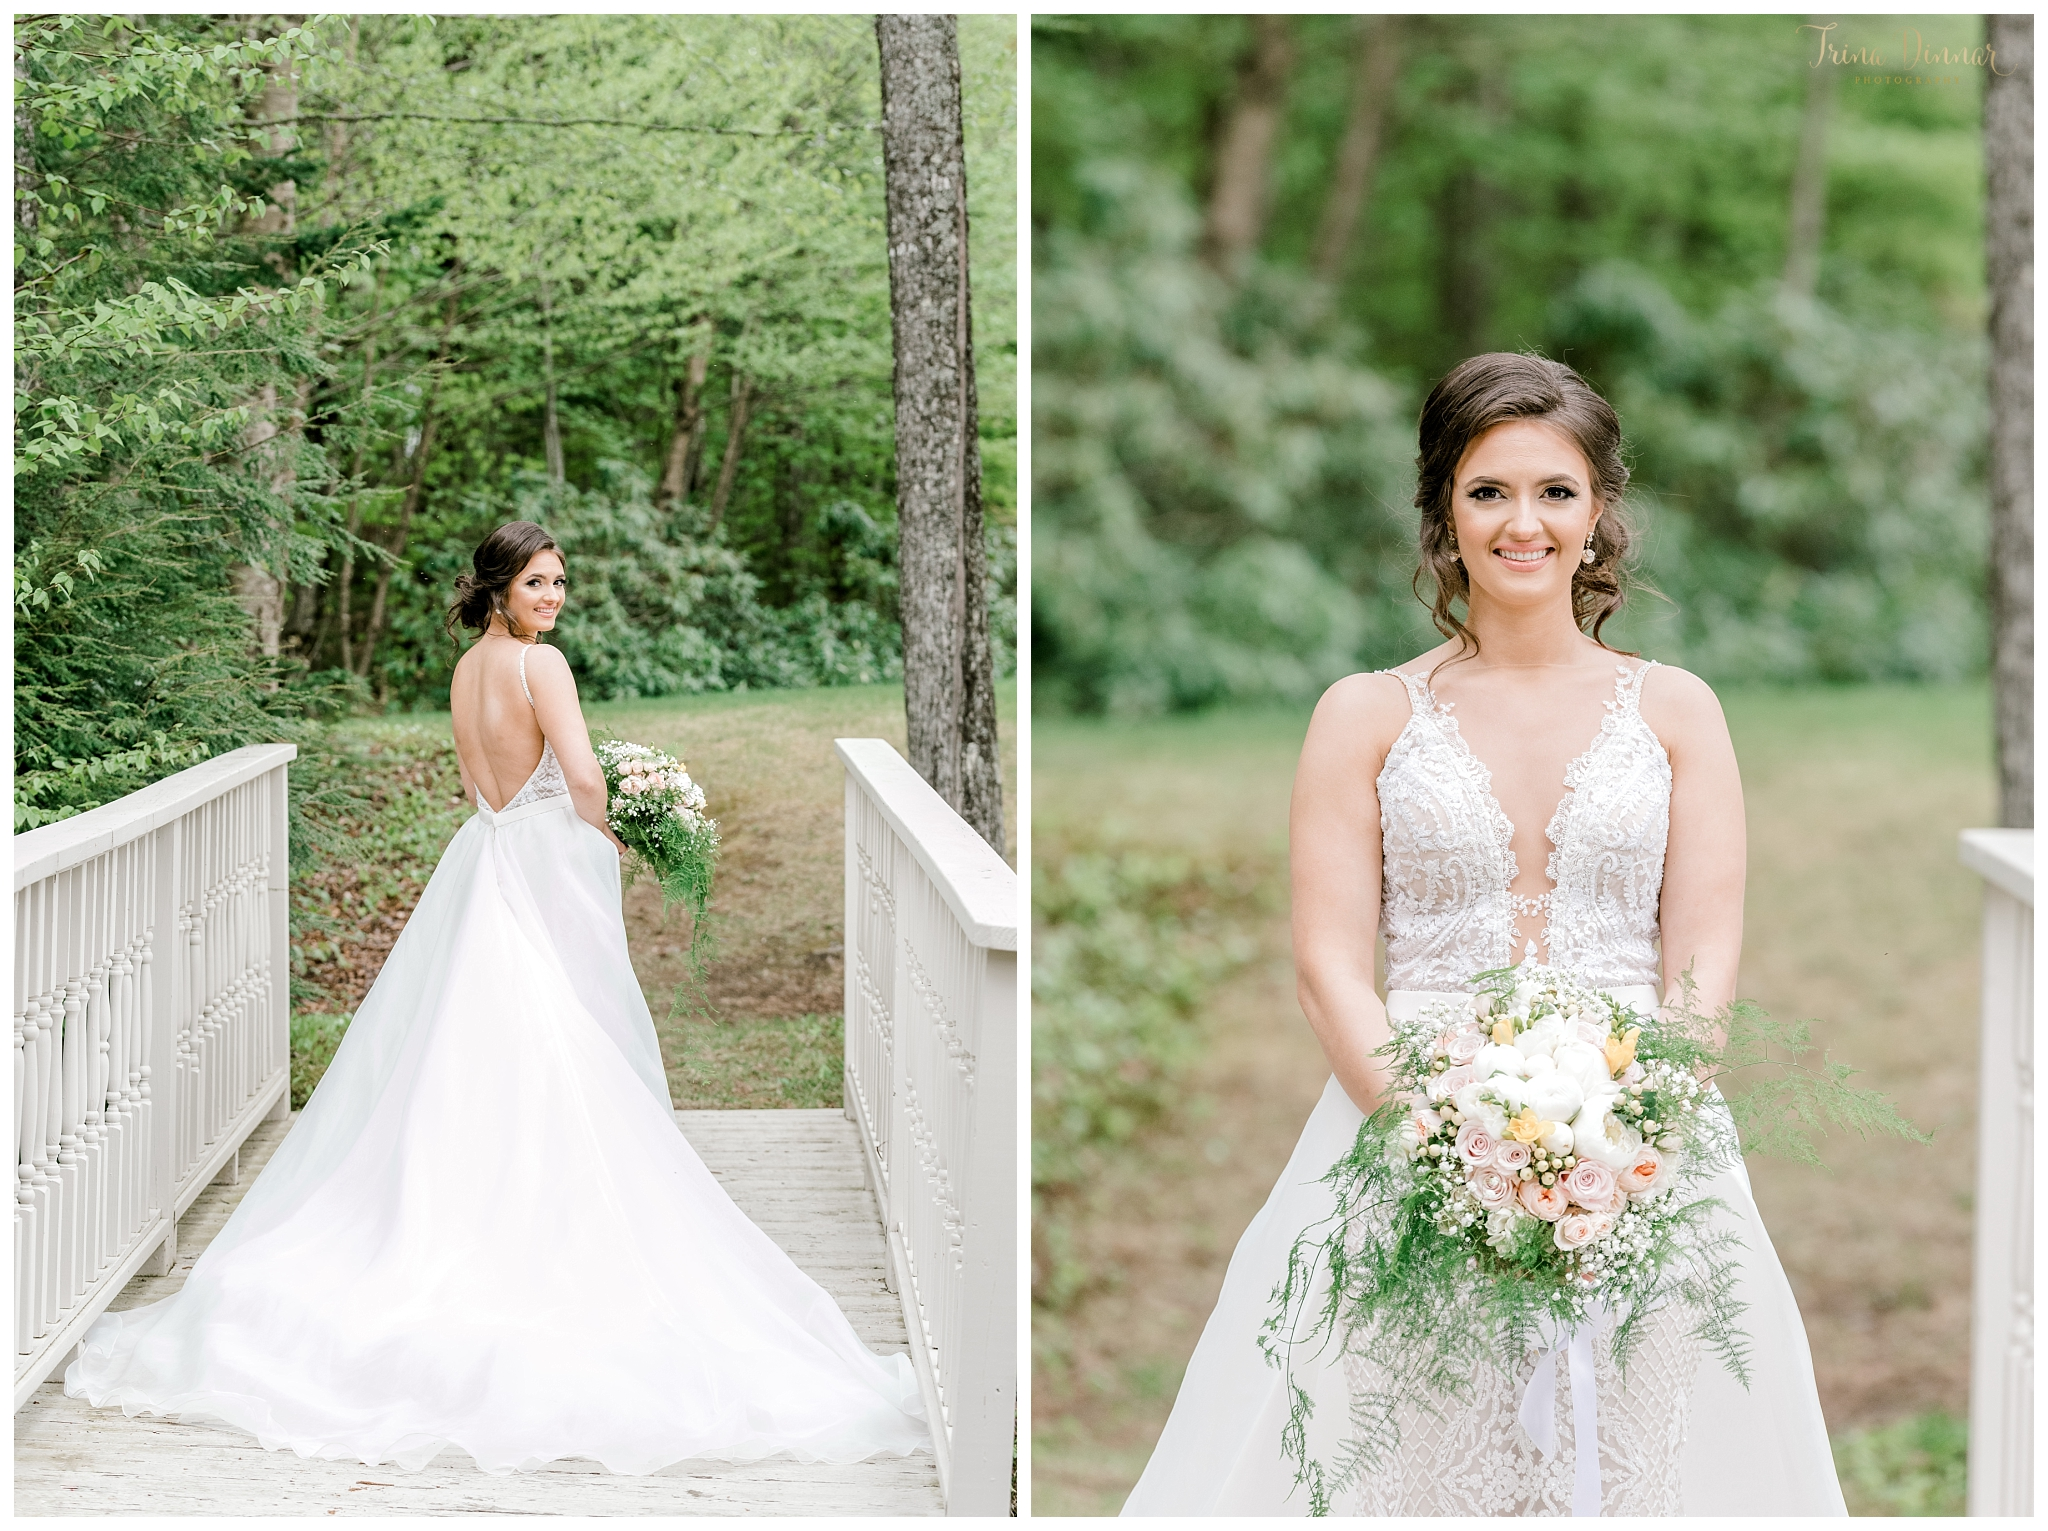 Greek Cultural Heritage Maine Bridal Portraits